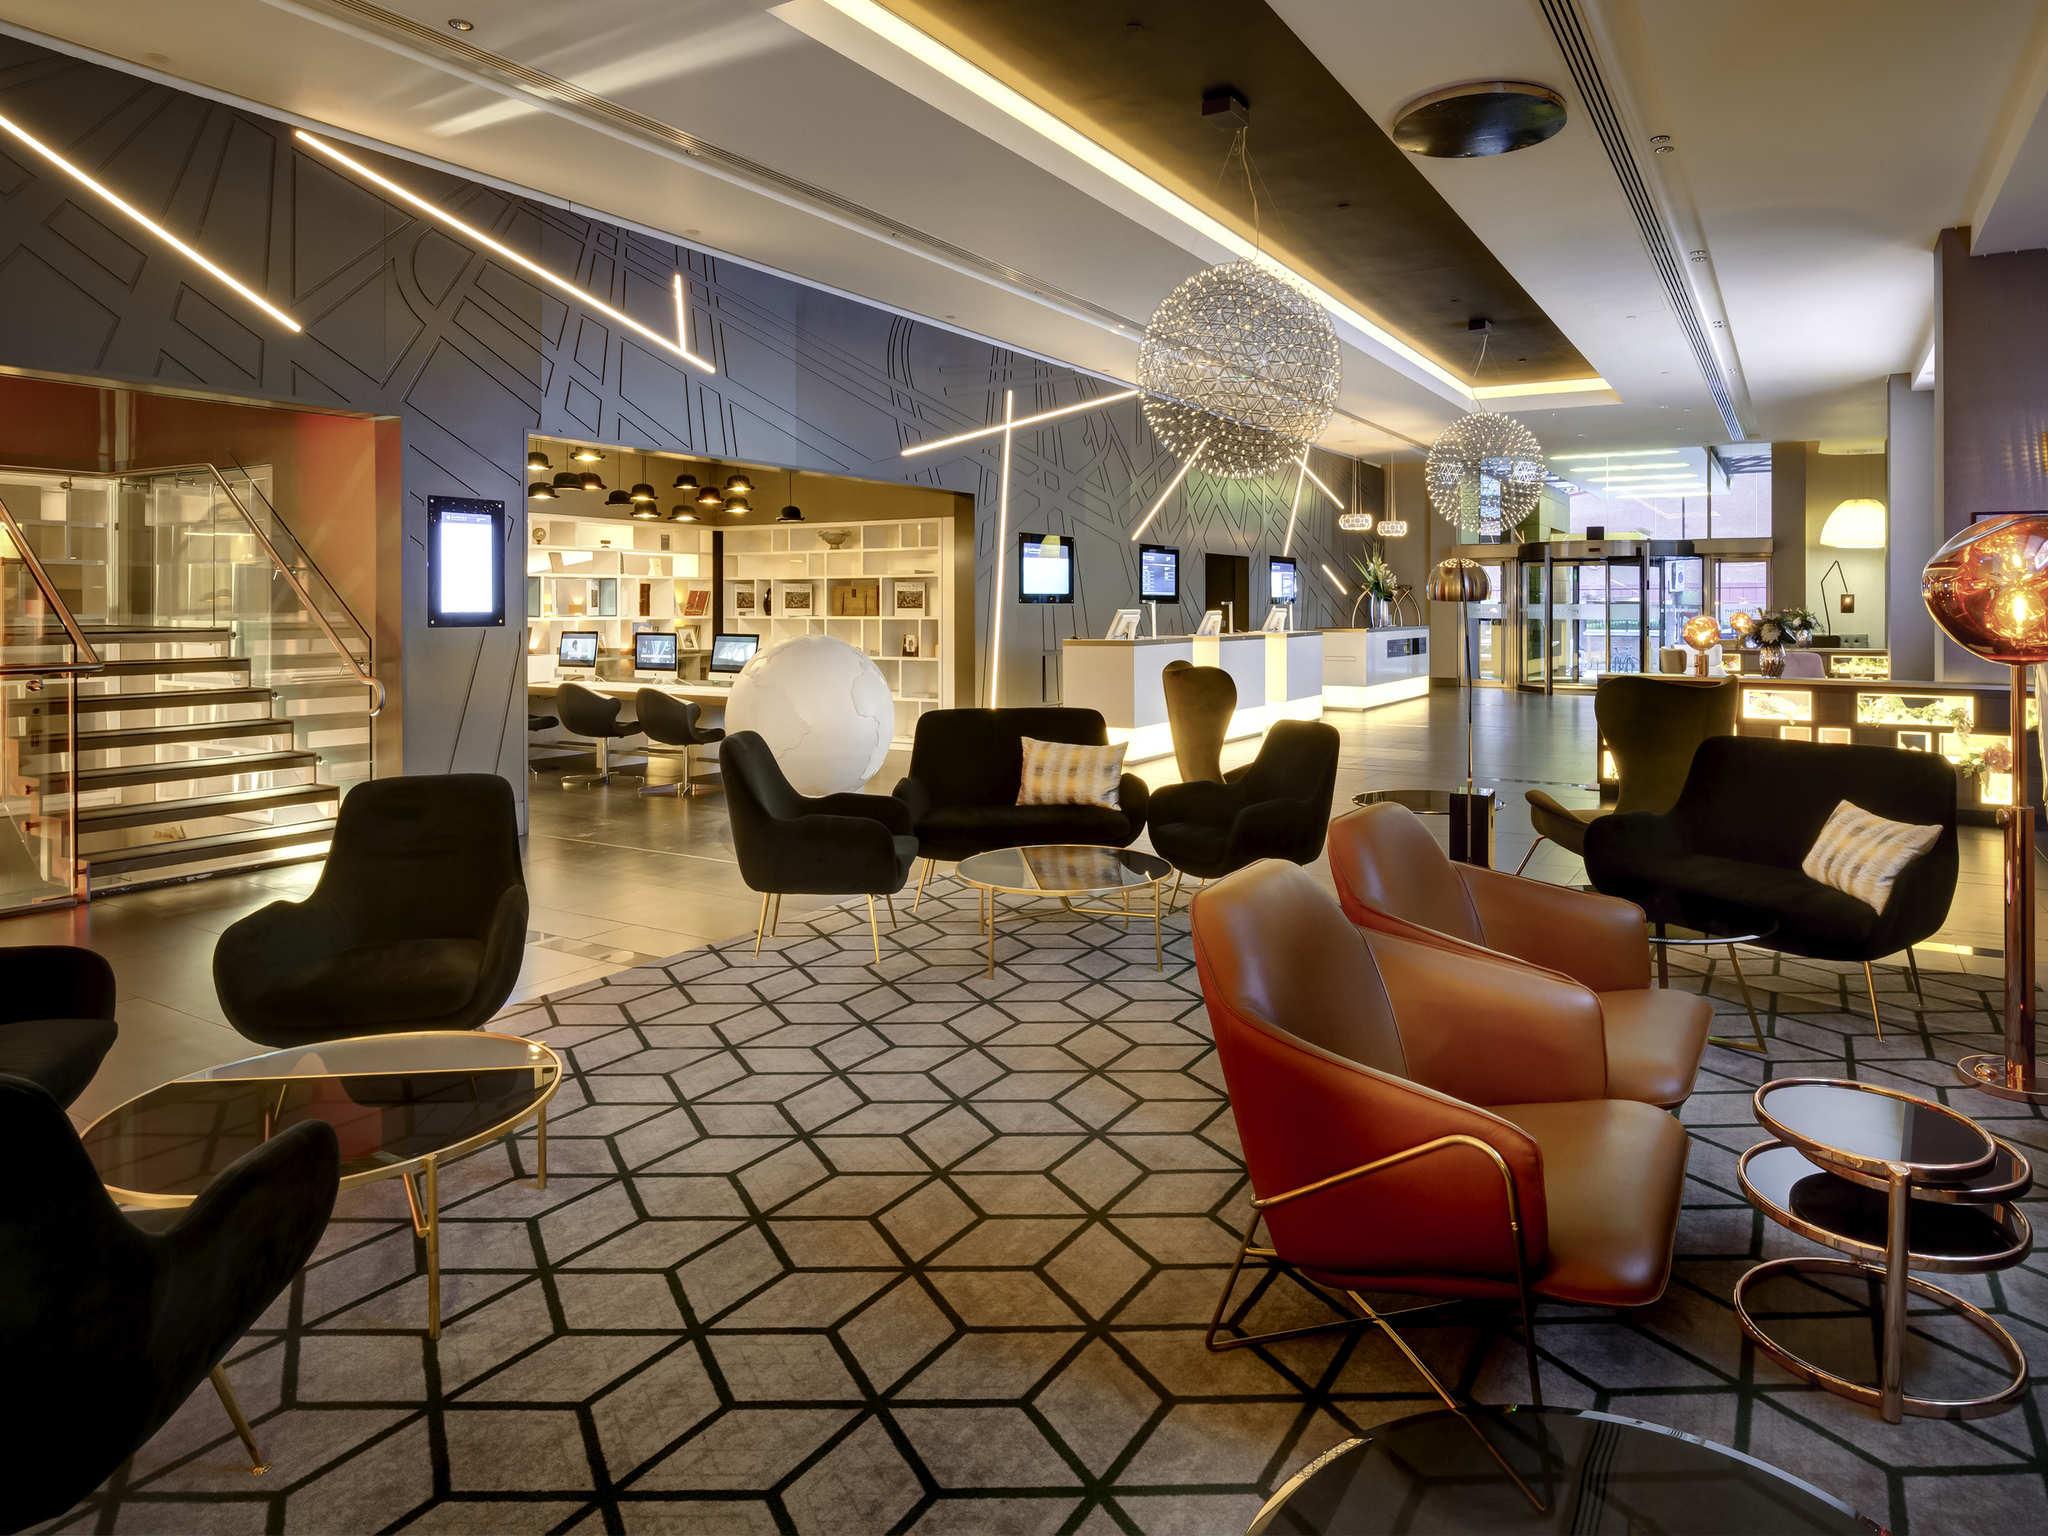 pullman london st pancras luxury hotels in london. Black Bedroom Furniture Sets. Home Design Ideas